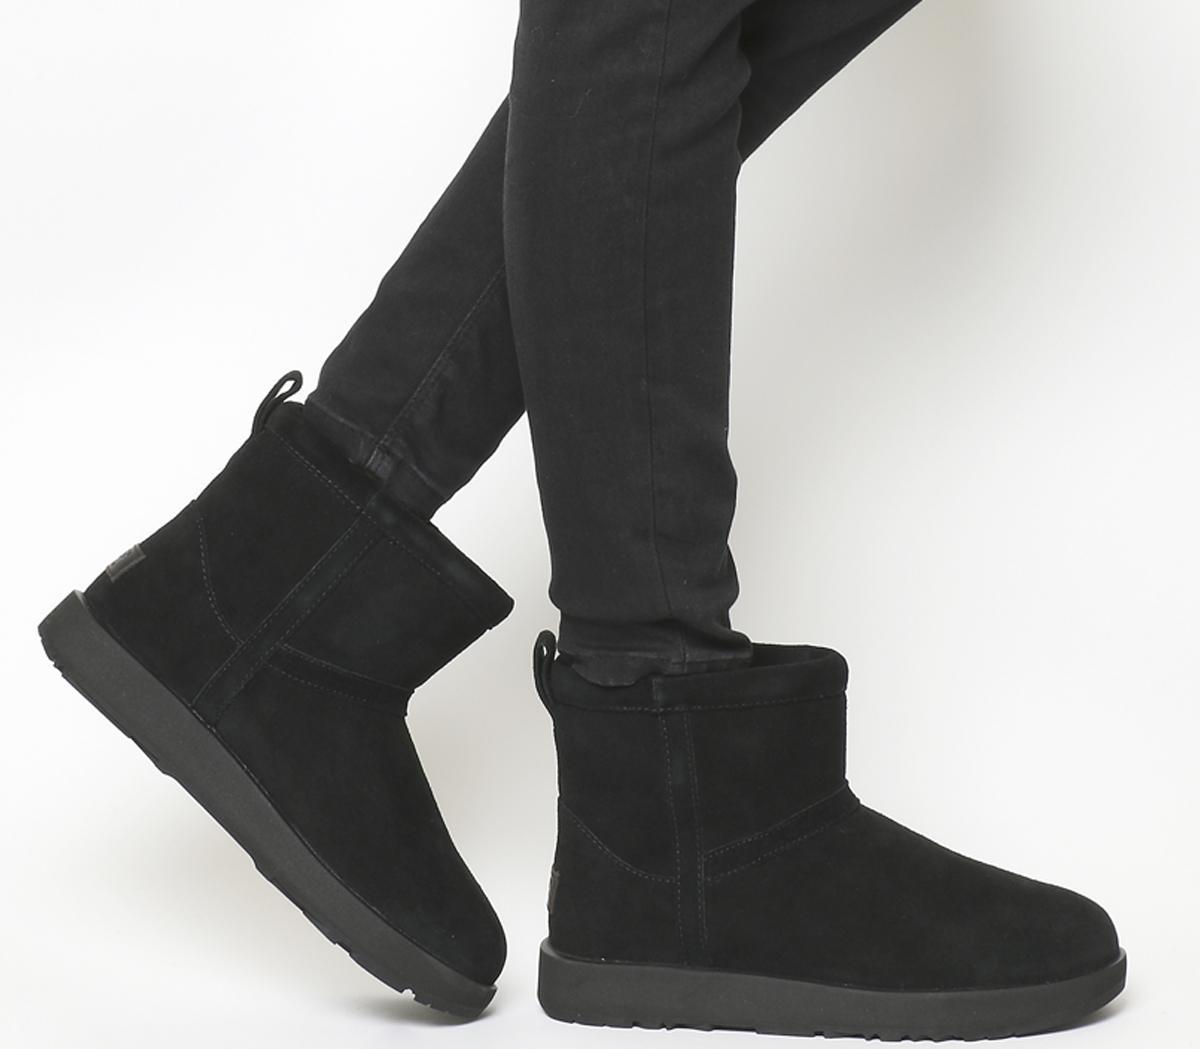 UGG Classic Mini Waterproof Boots Black